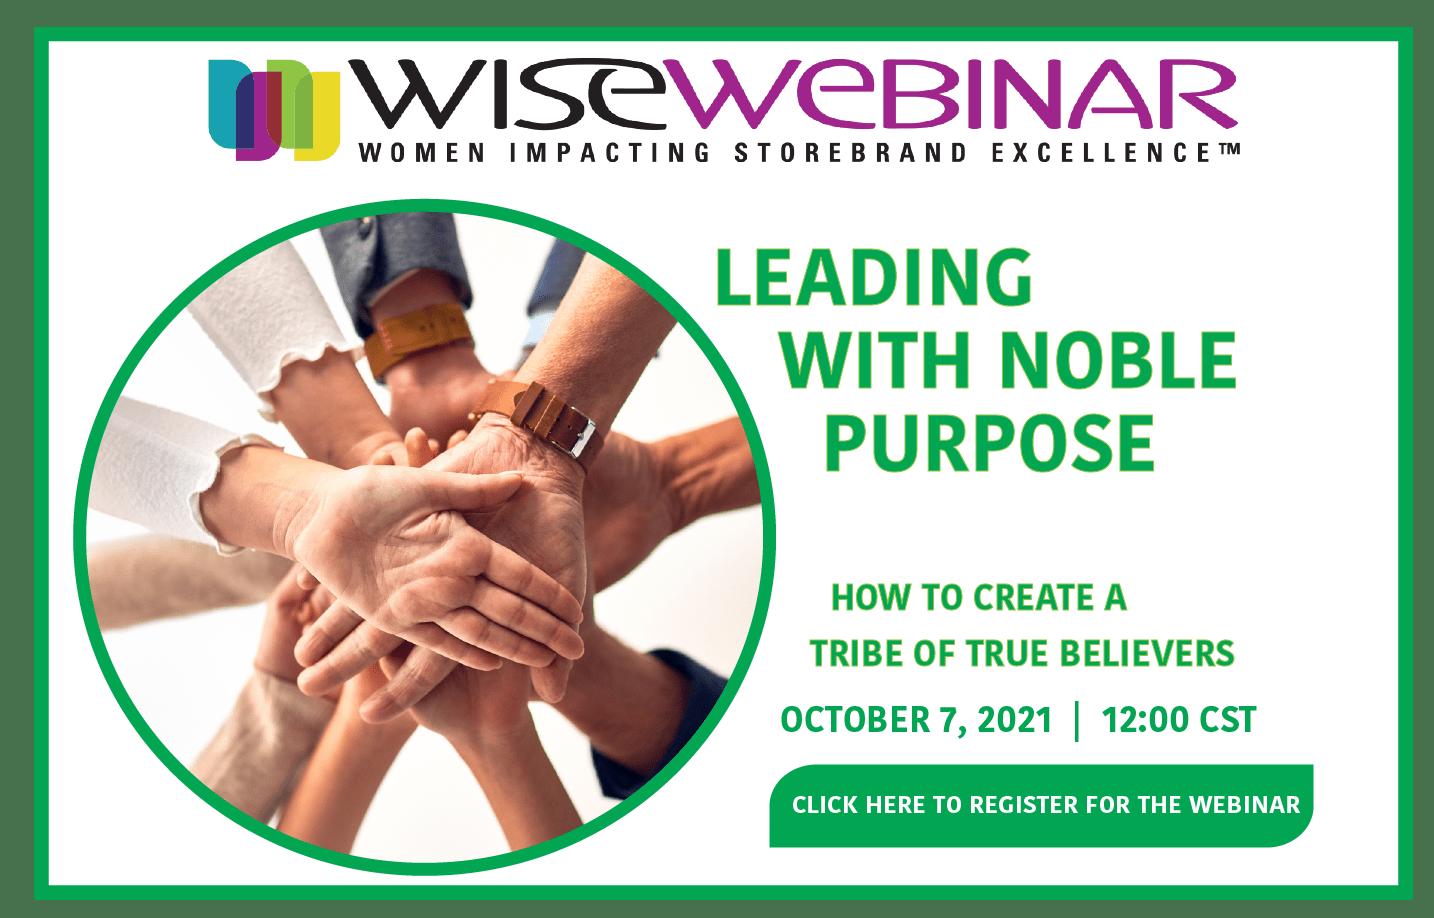 WISE-256 Noble Purpose Website 0824A_Artboard 2